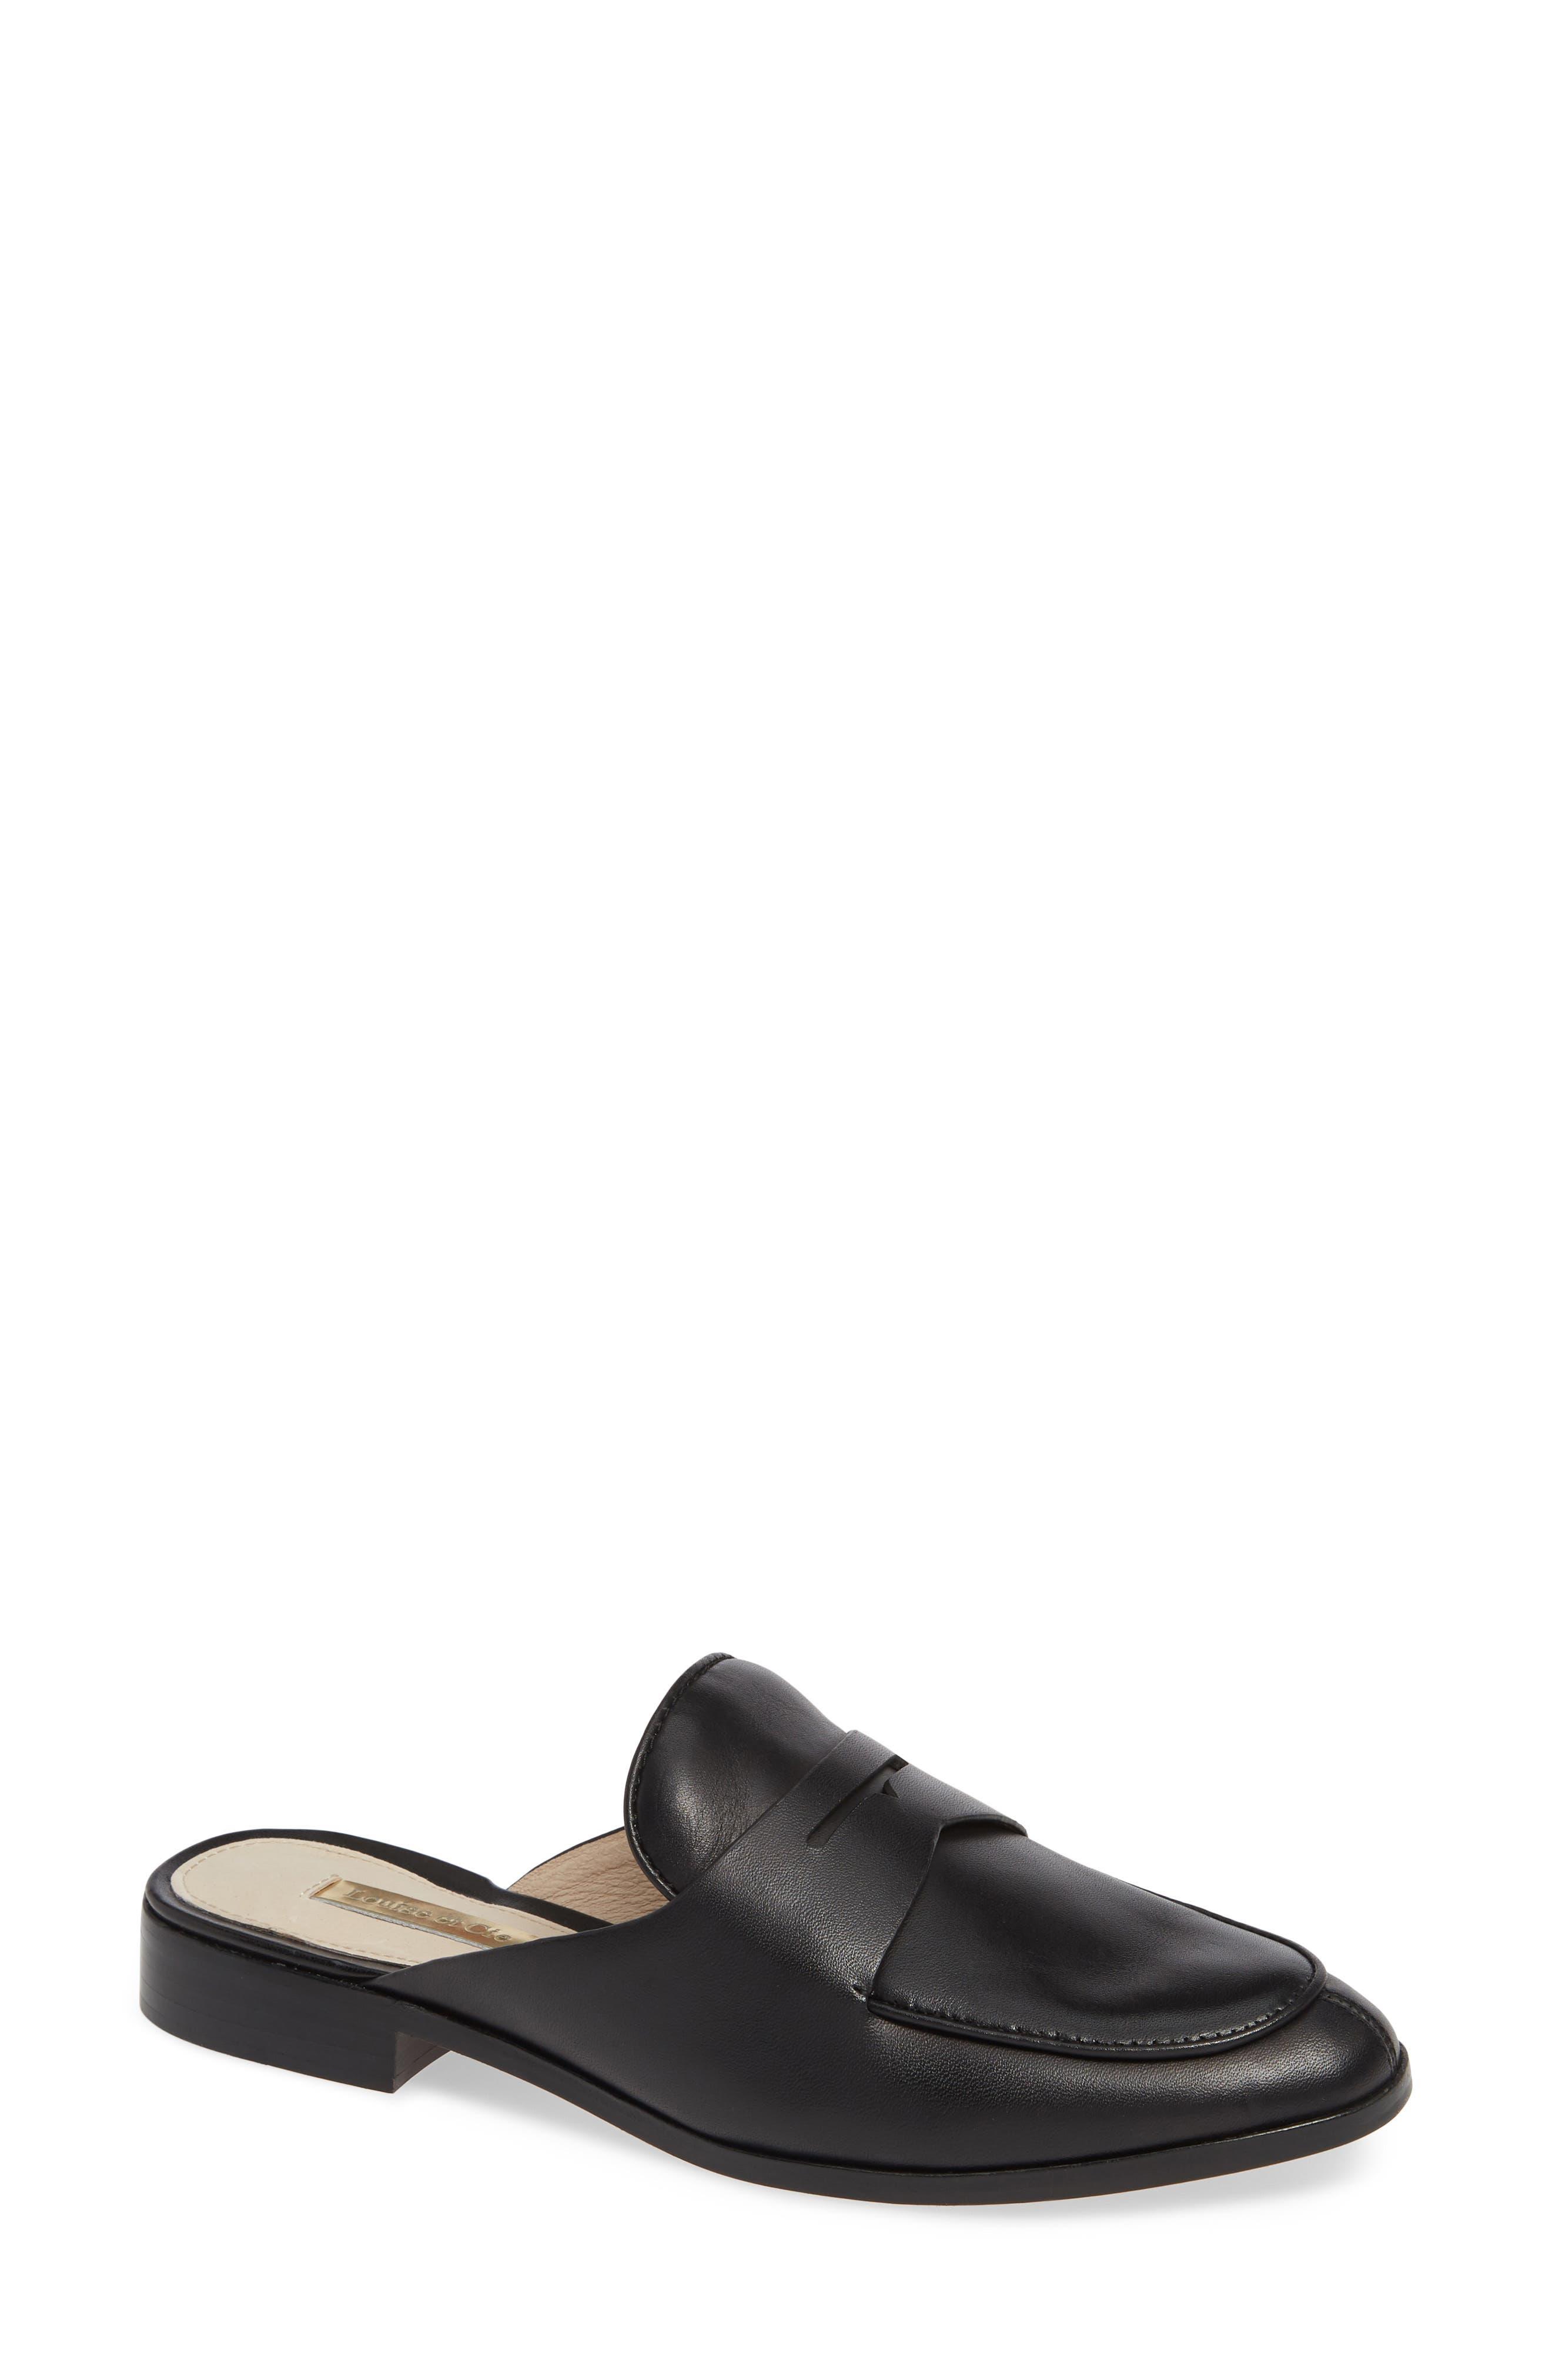 Louise Et Cie Dugan Flat Loafer Mule- Black